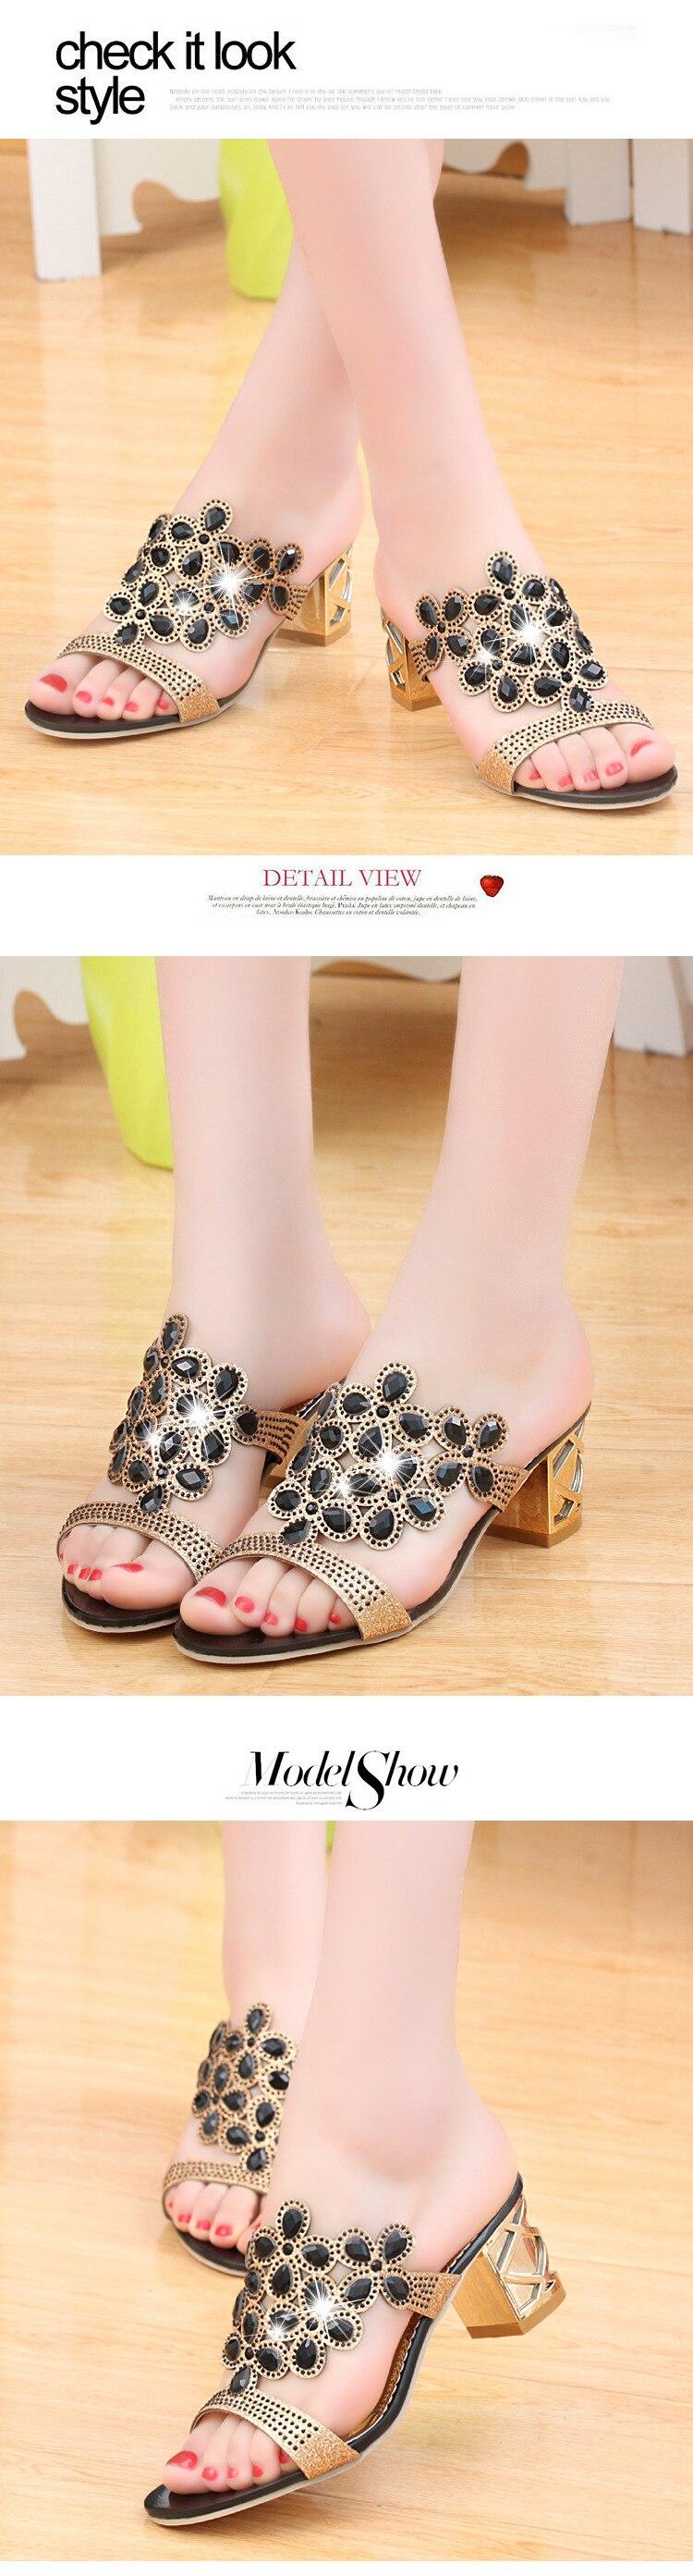 HTB1U.aIiQKWBuNjy1zjq6AOypXa6 Designer Sandals Women 2018 Ladies Slides Women Slippers Sandals Summer Crystal Shoes Peep Toe Middle Heels Zapatos Mujer